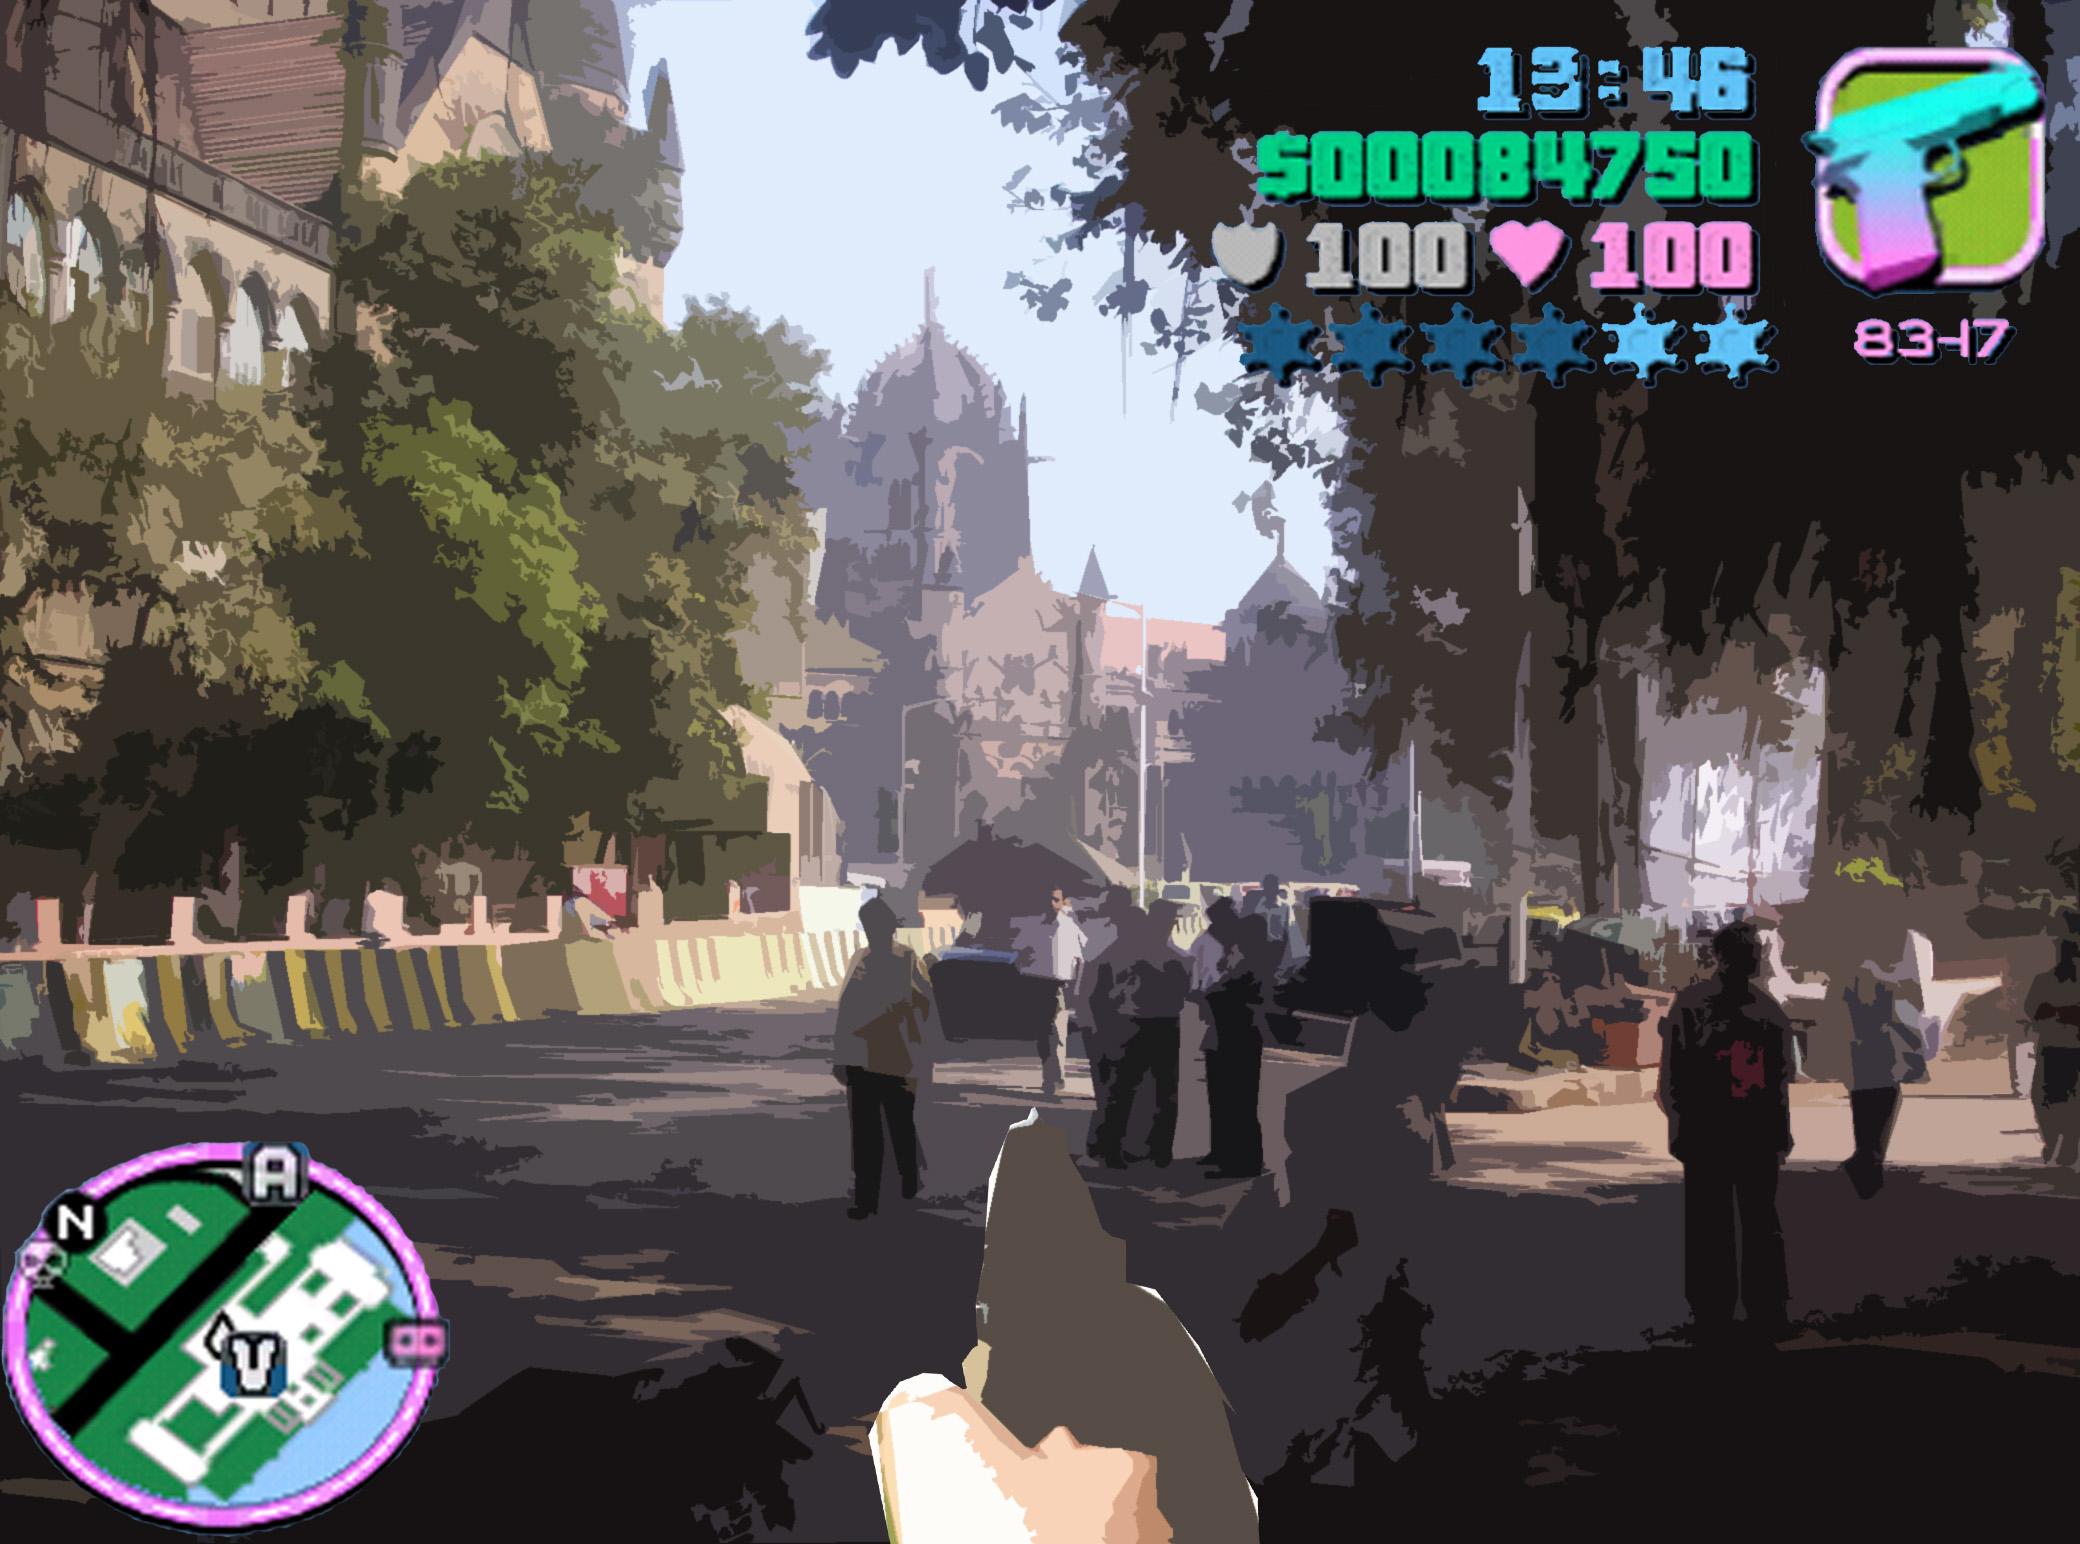 Gta pune city games free download pc | used wholesale bulk in.